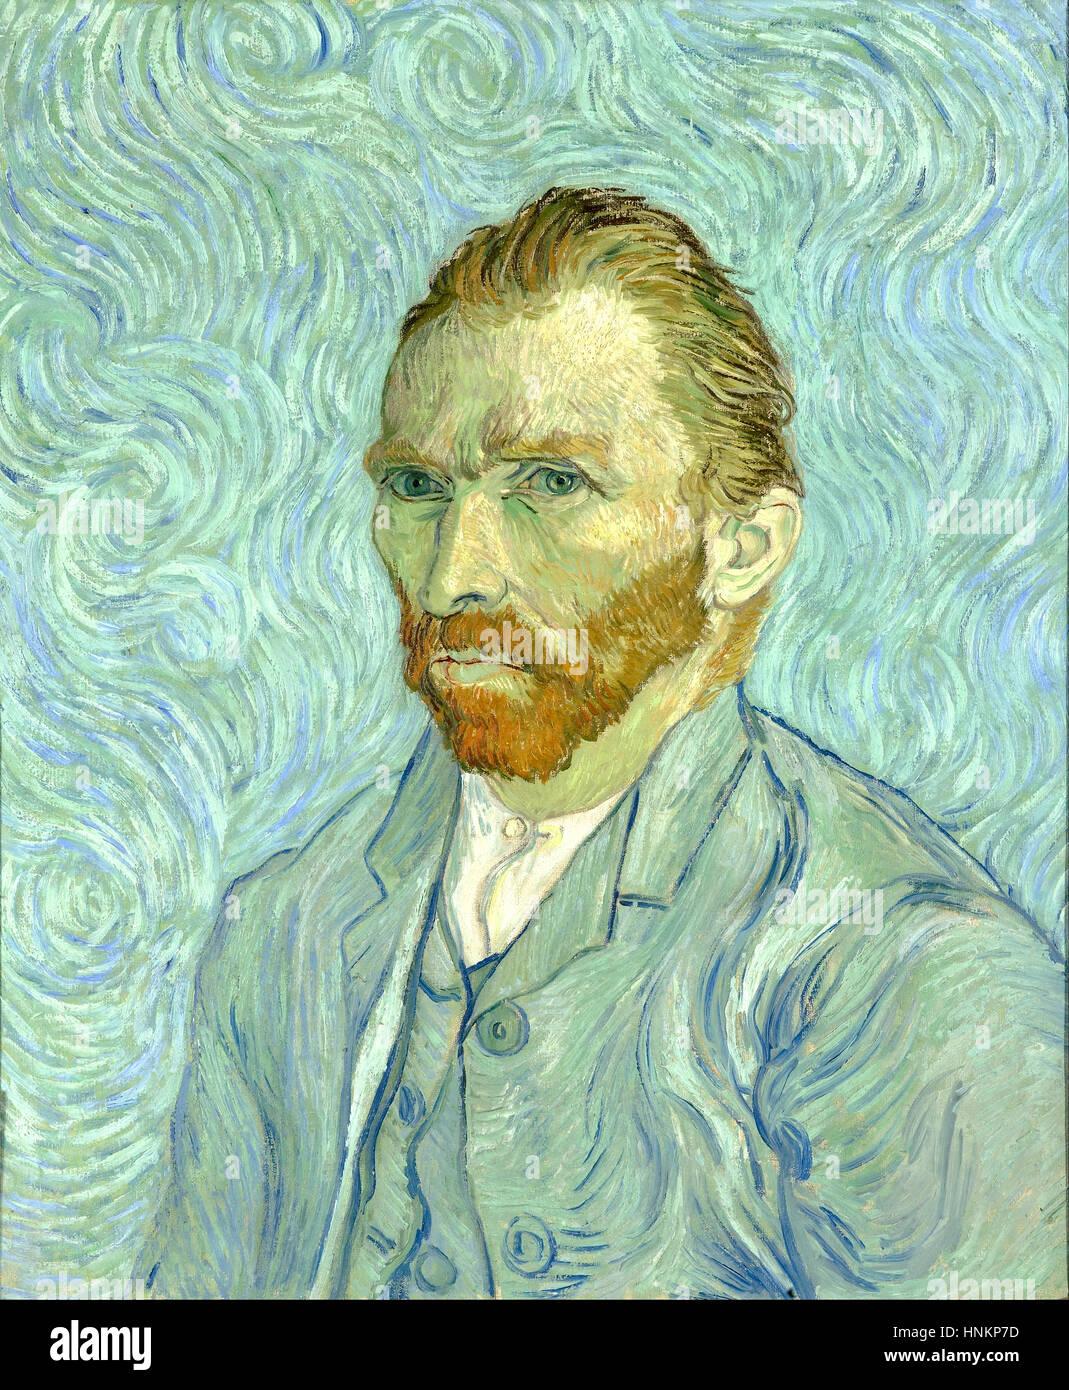 Vincent Willem van Gogh, Dutch Post-Impressionist painter